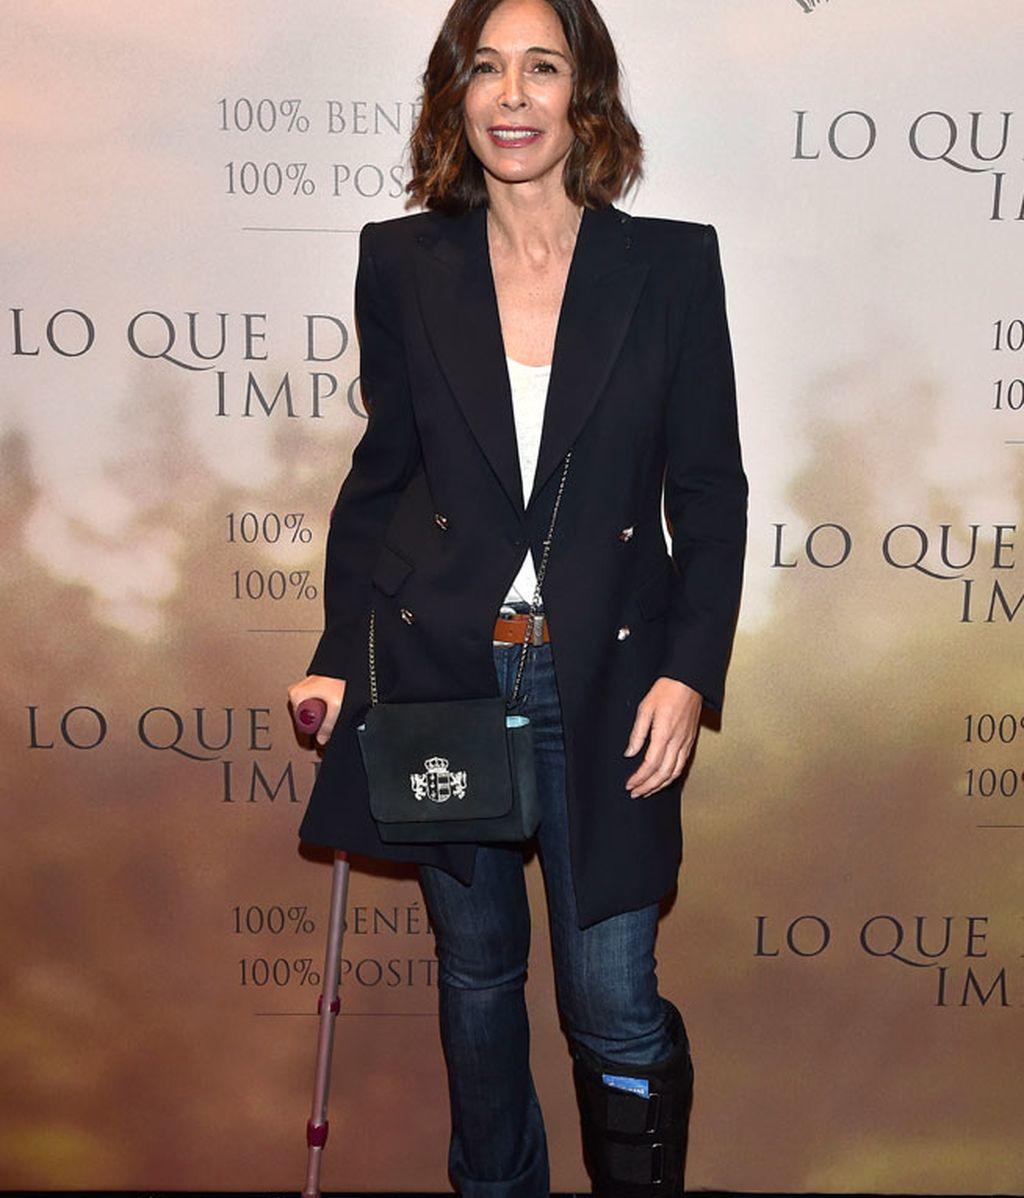 A Lidia Bosch su 'mala pata' no le impidió asistir al evento